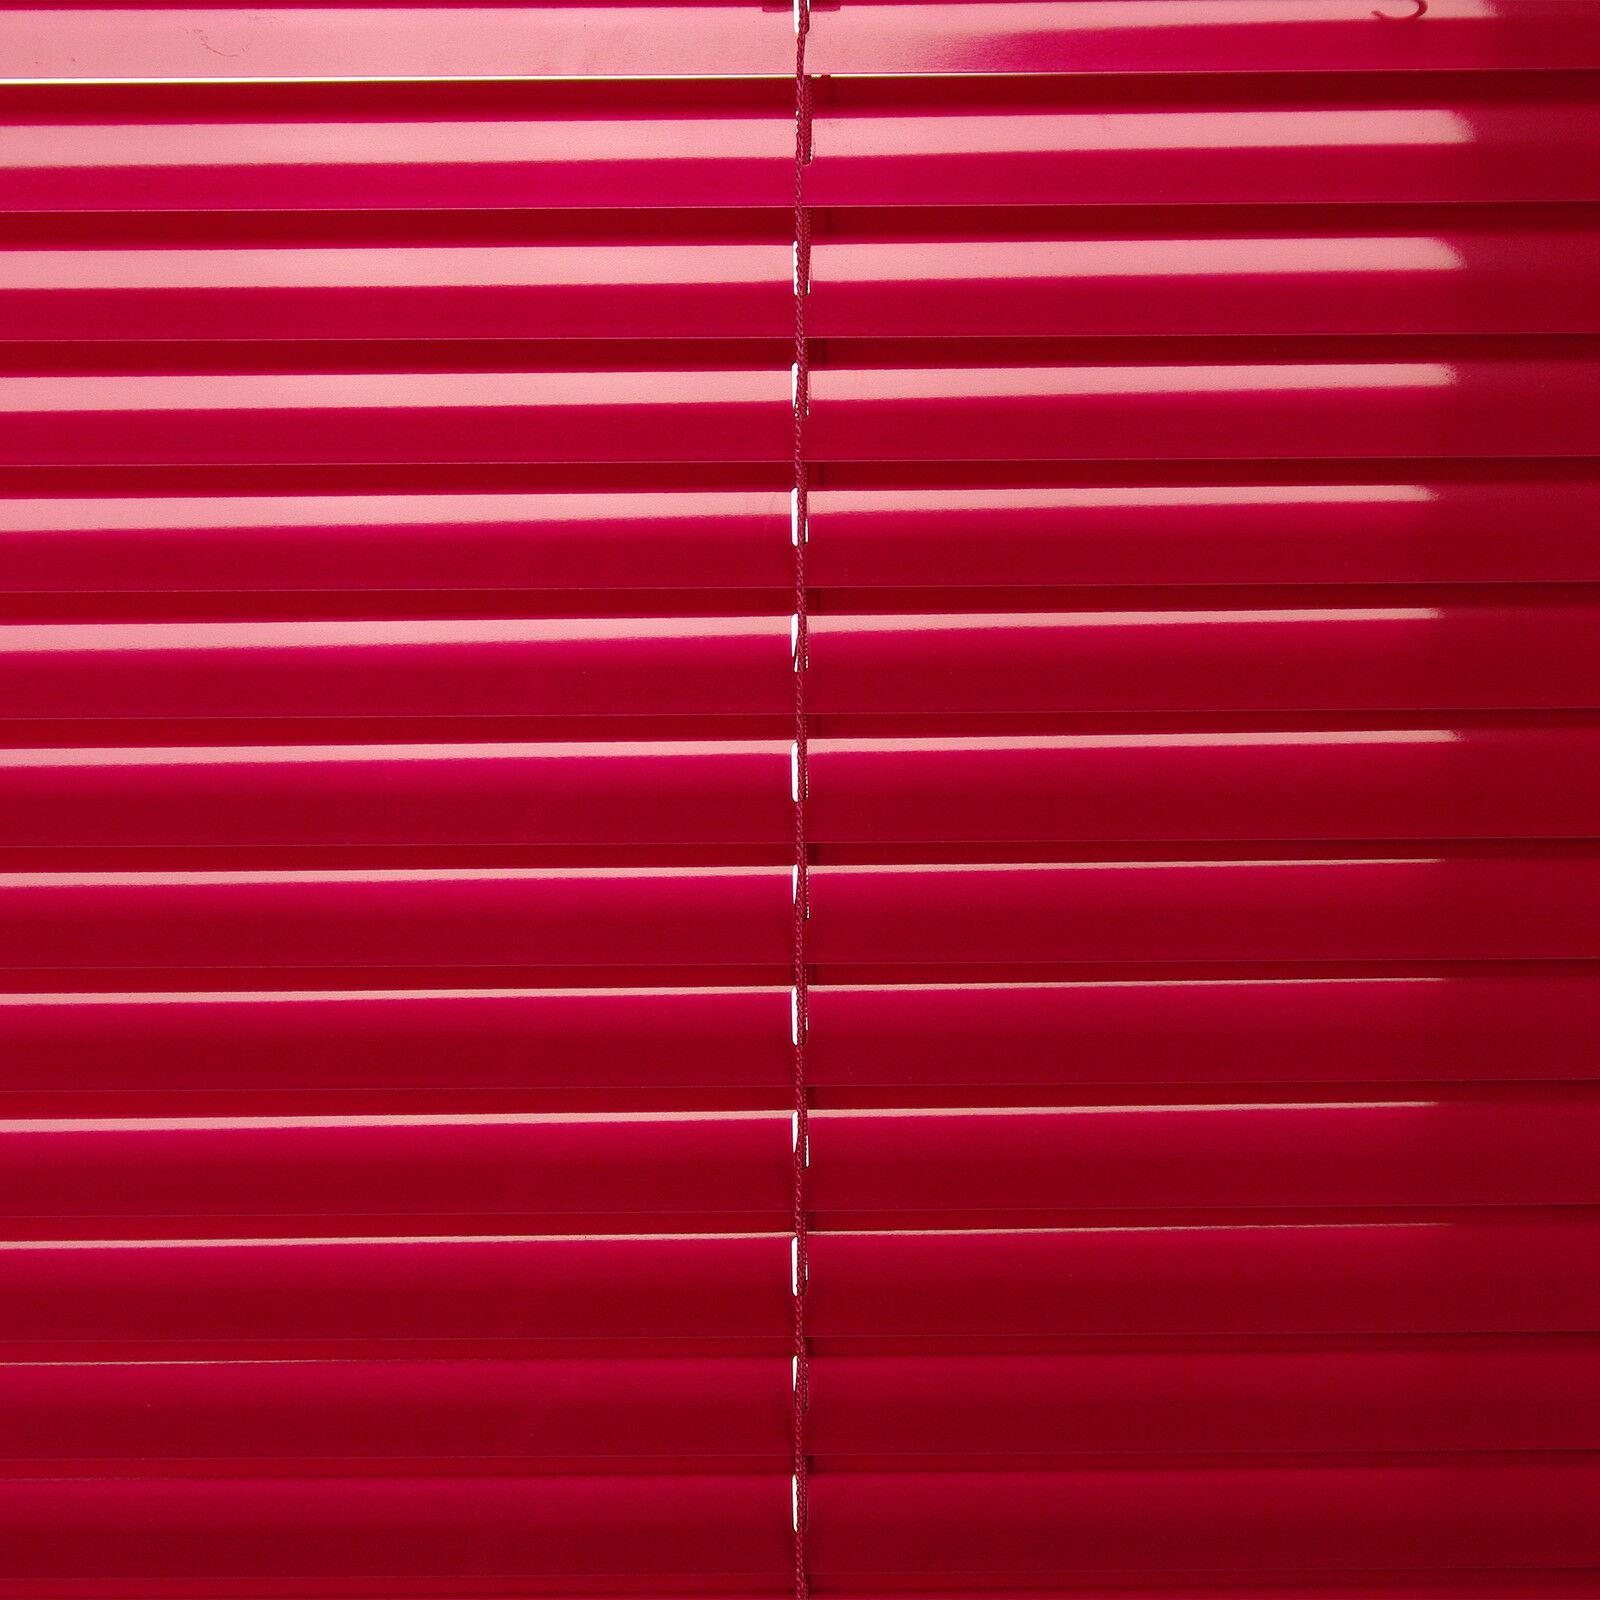 Alu Jalousie Aluminium Lamelle Fenster Rollo Jalousette 120 x 160 160 160 rot Magnolia | Shop  ea482b